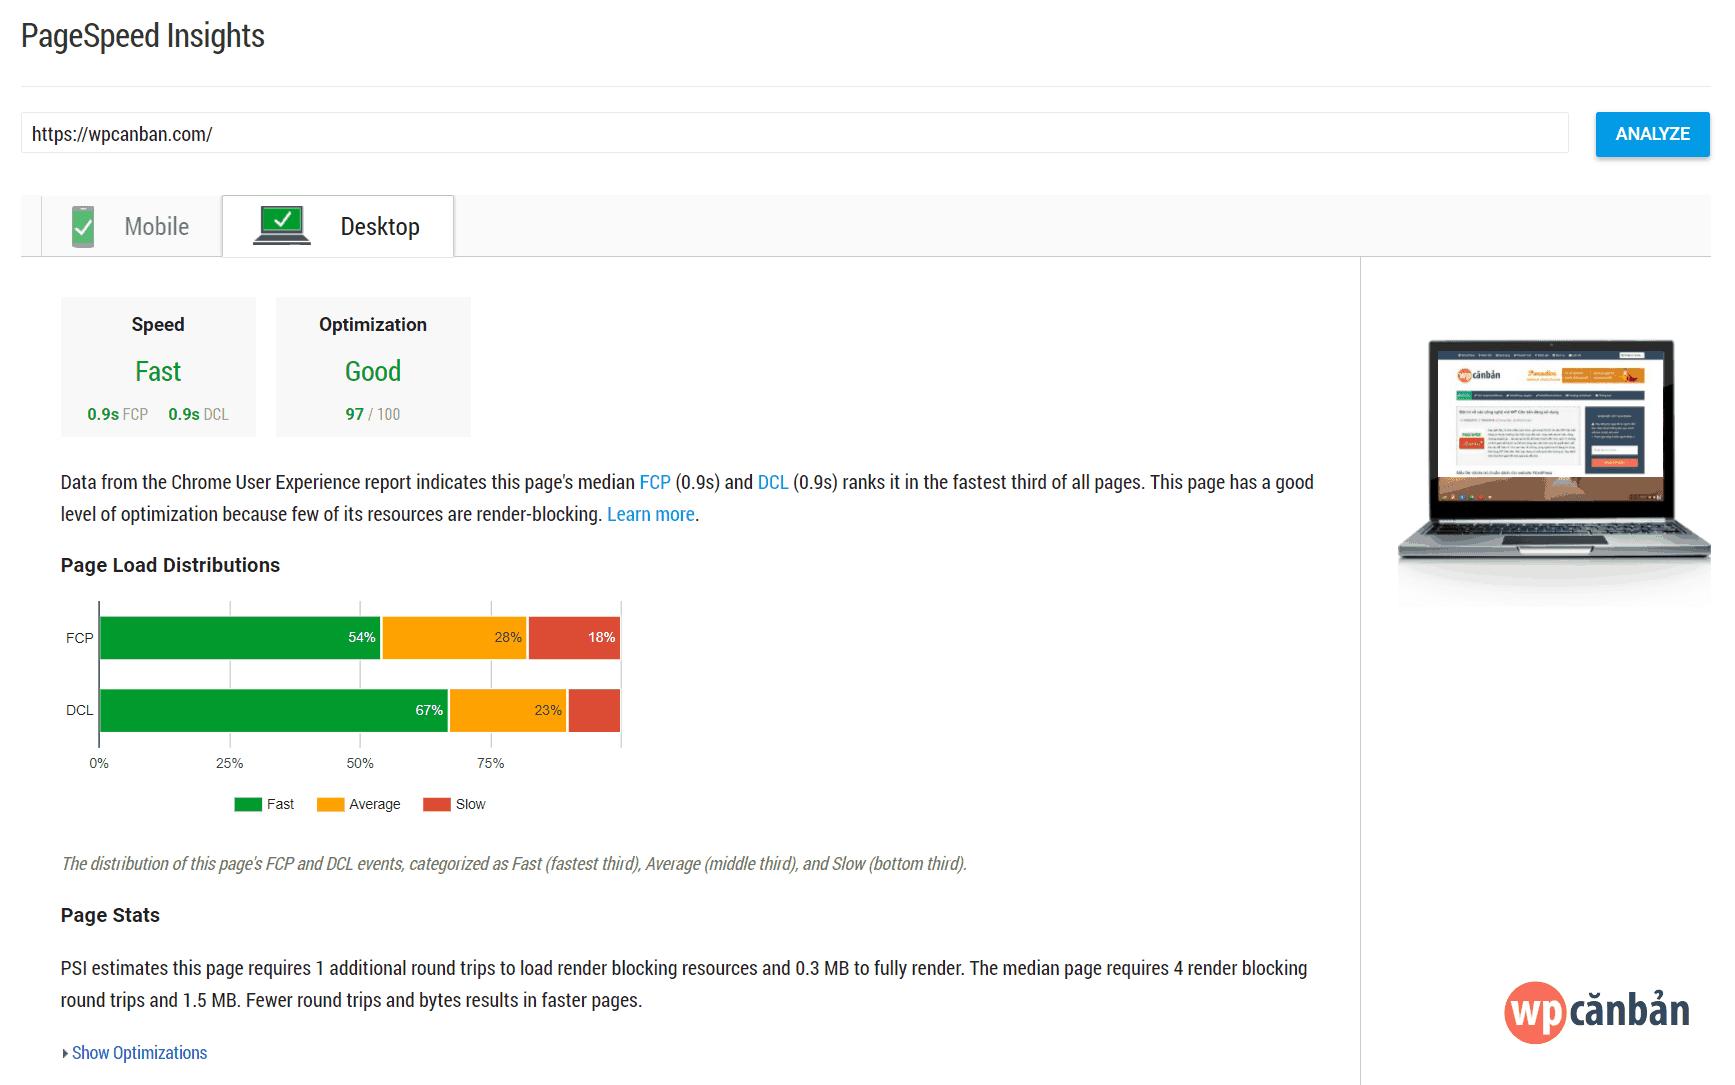 kiem-tra-toc-do-load-voi-google-pagespeed-insights